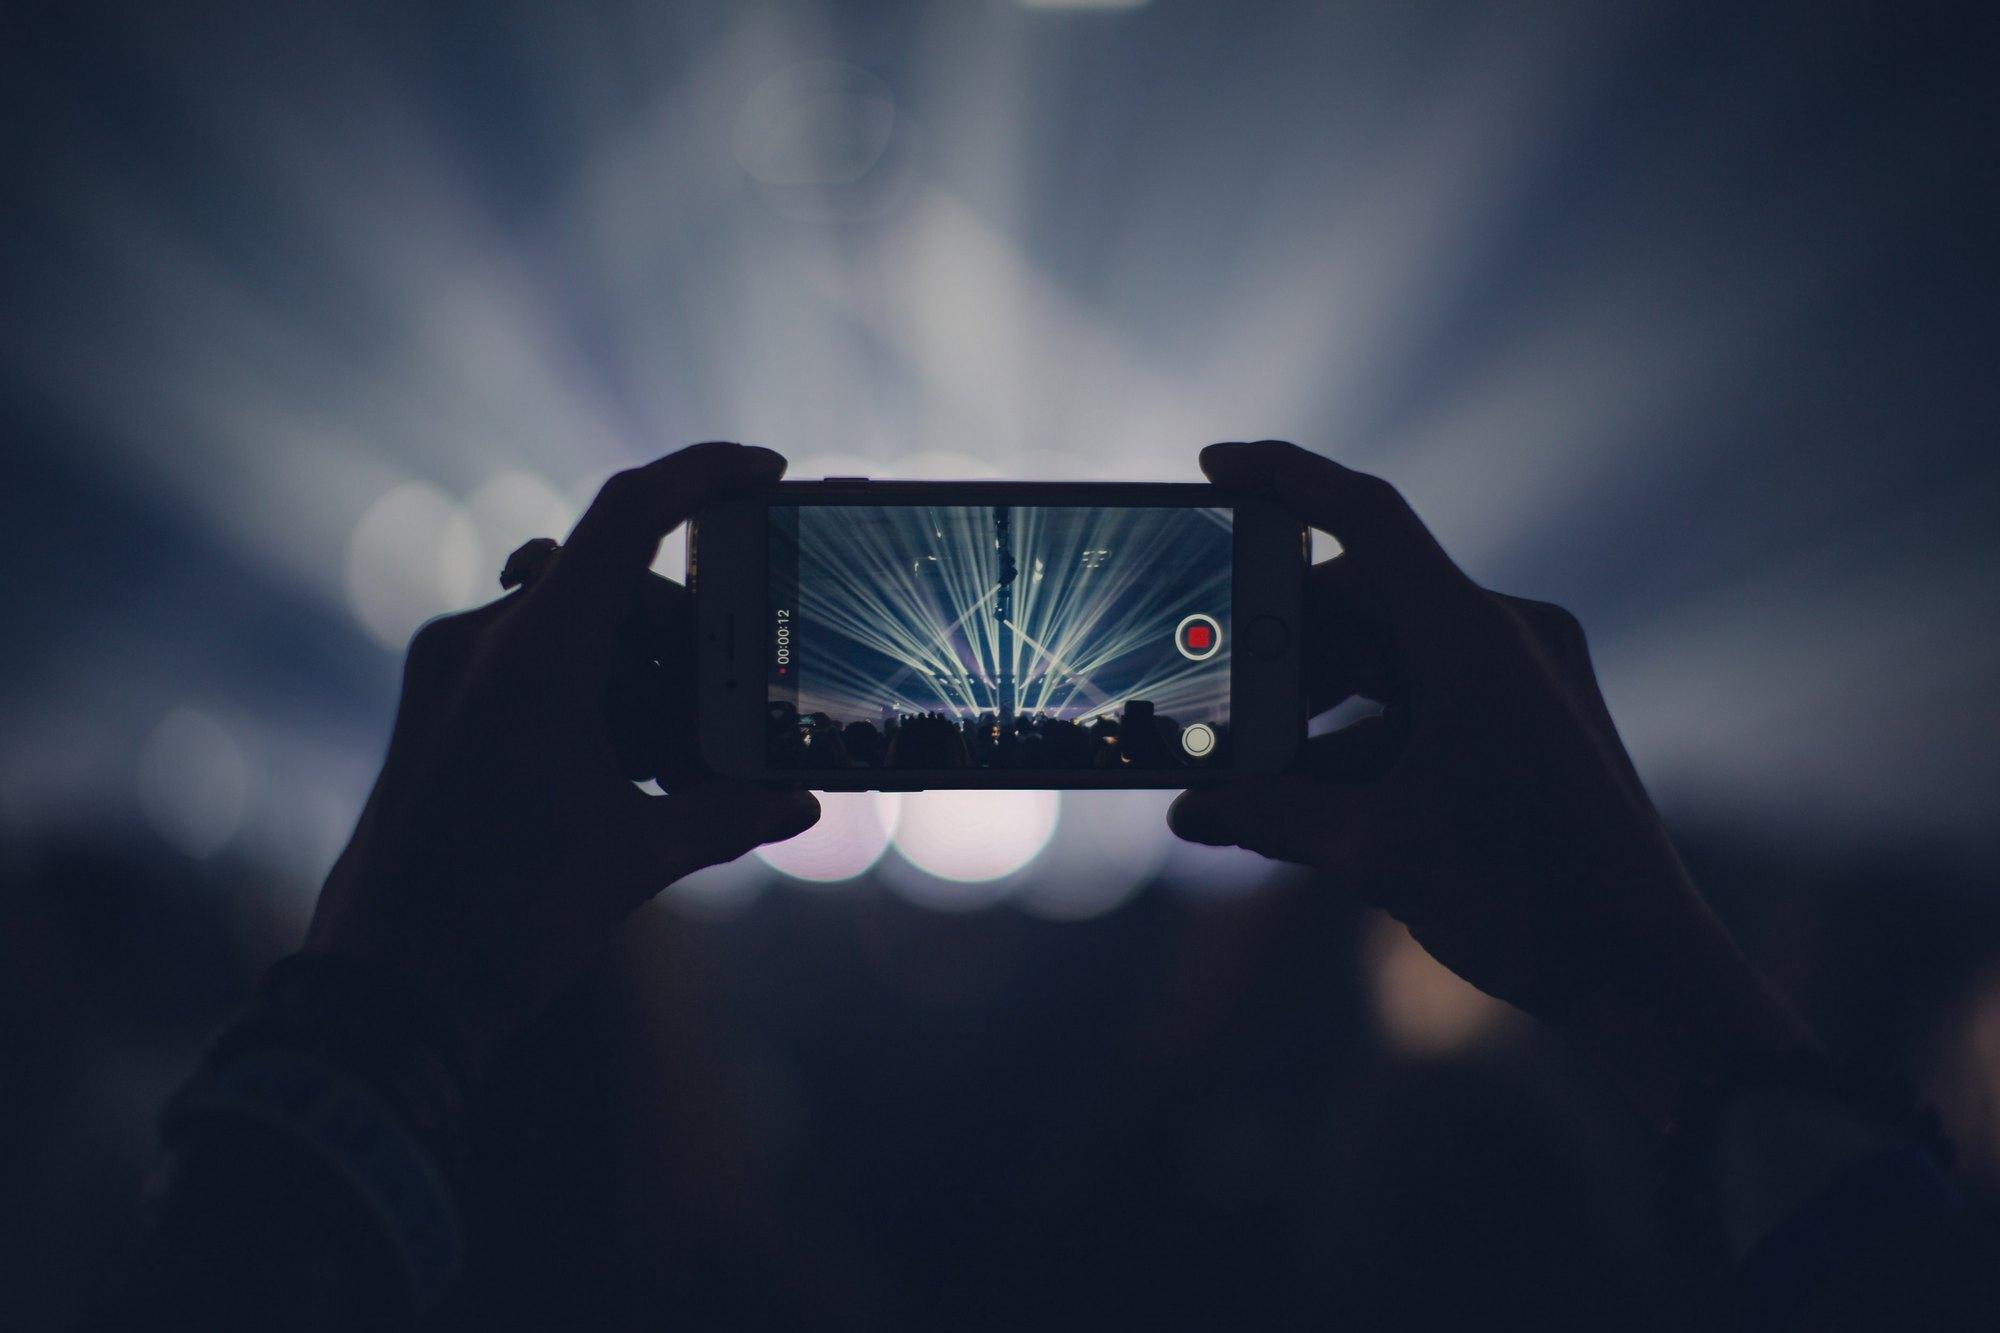 Shooting video on smartphone